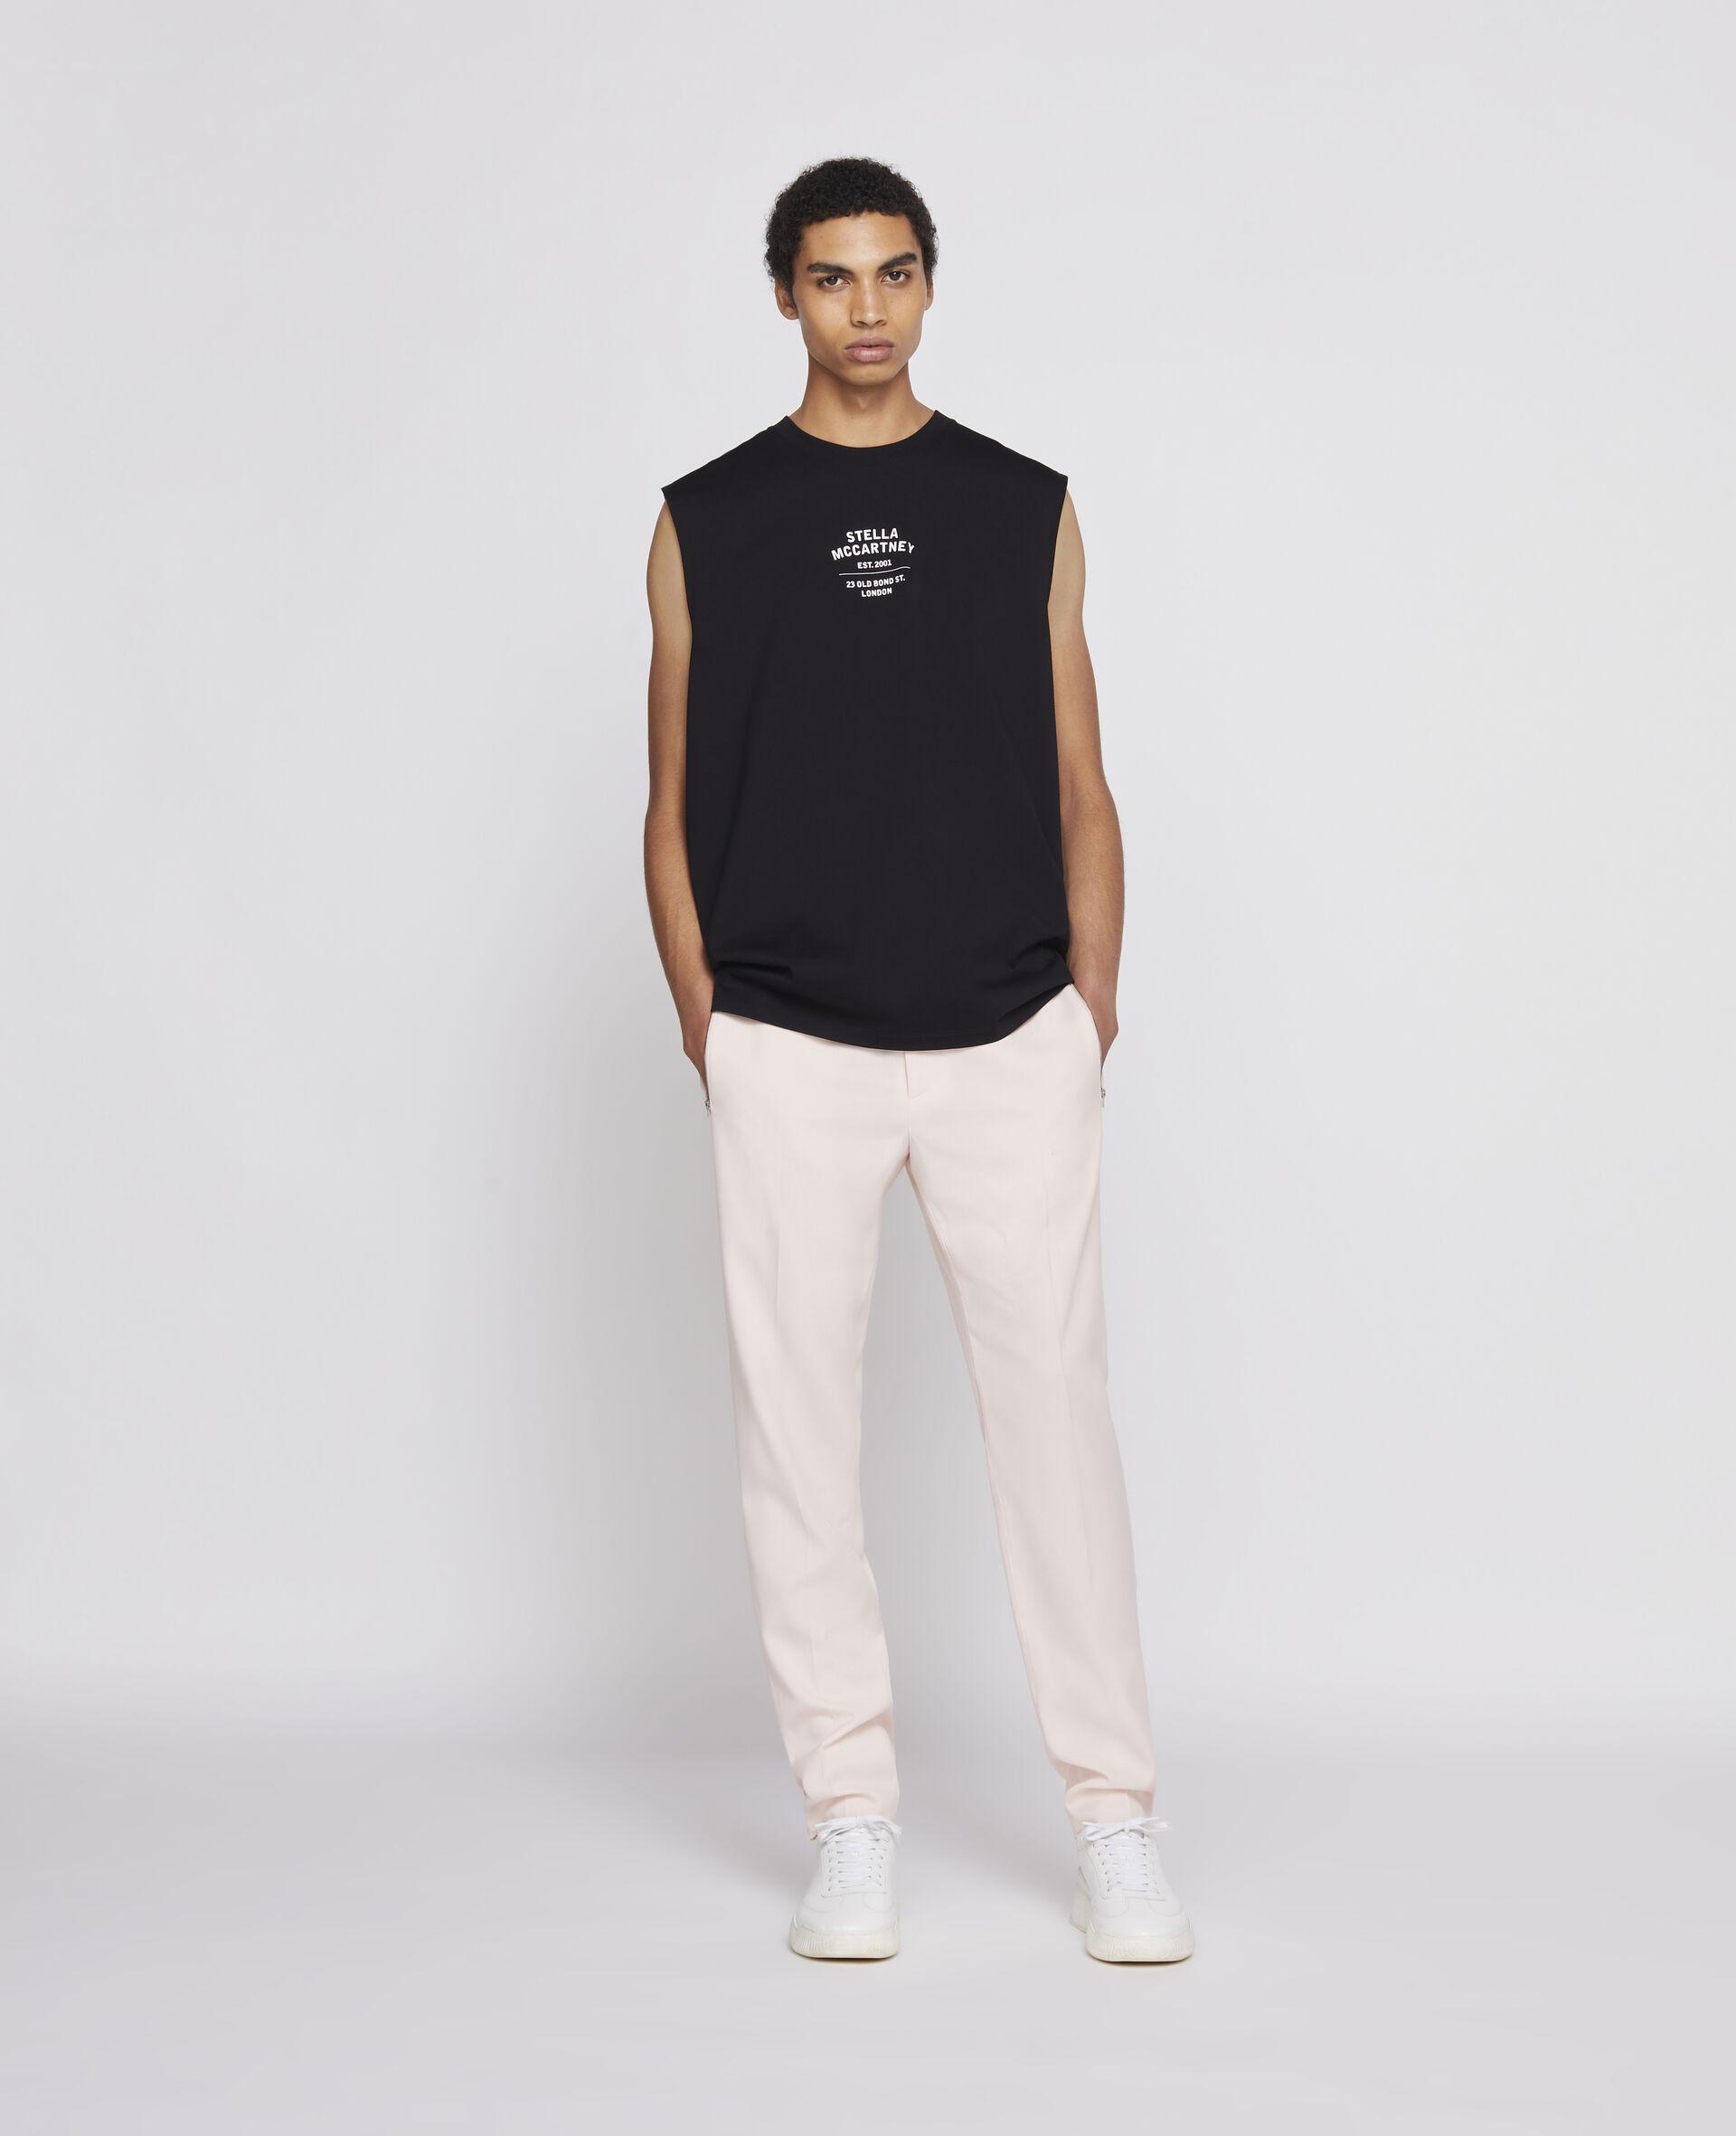 23 OBS Sleevless T-shirt-Black-large image number 1